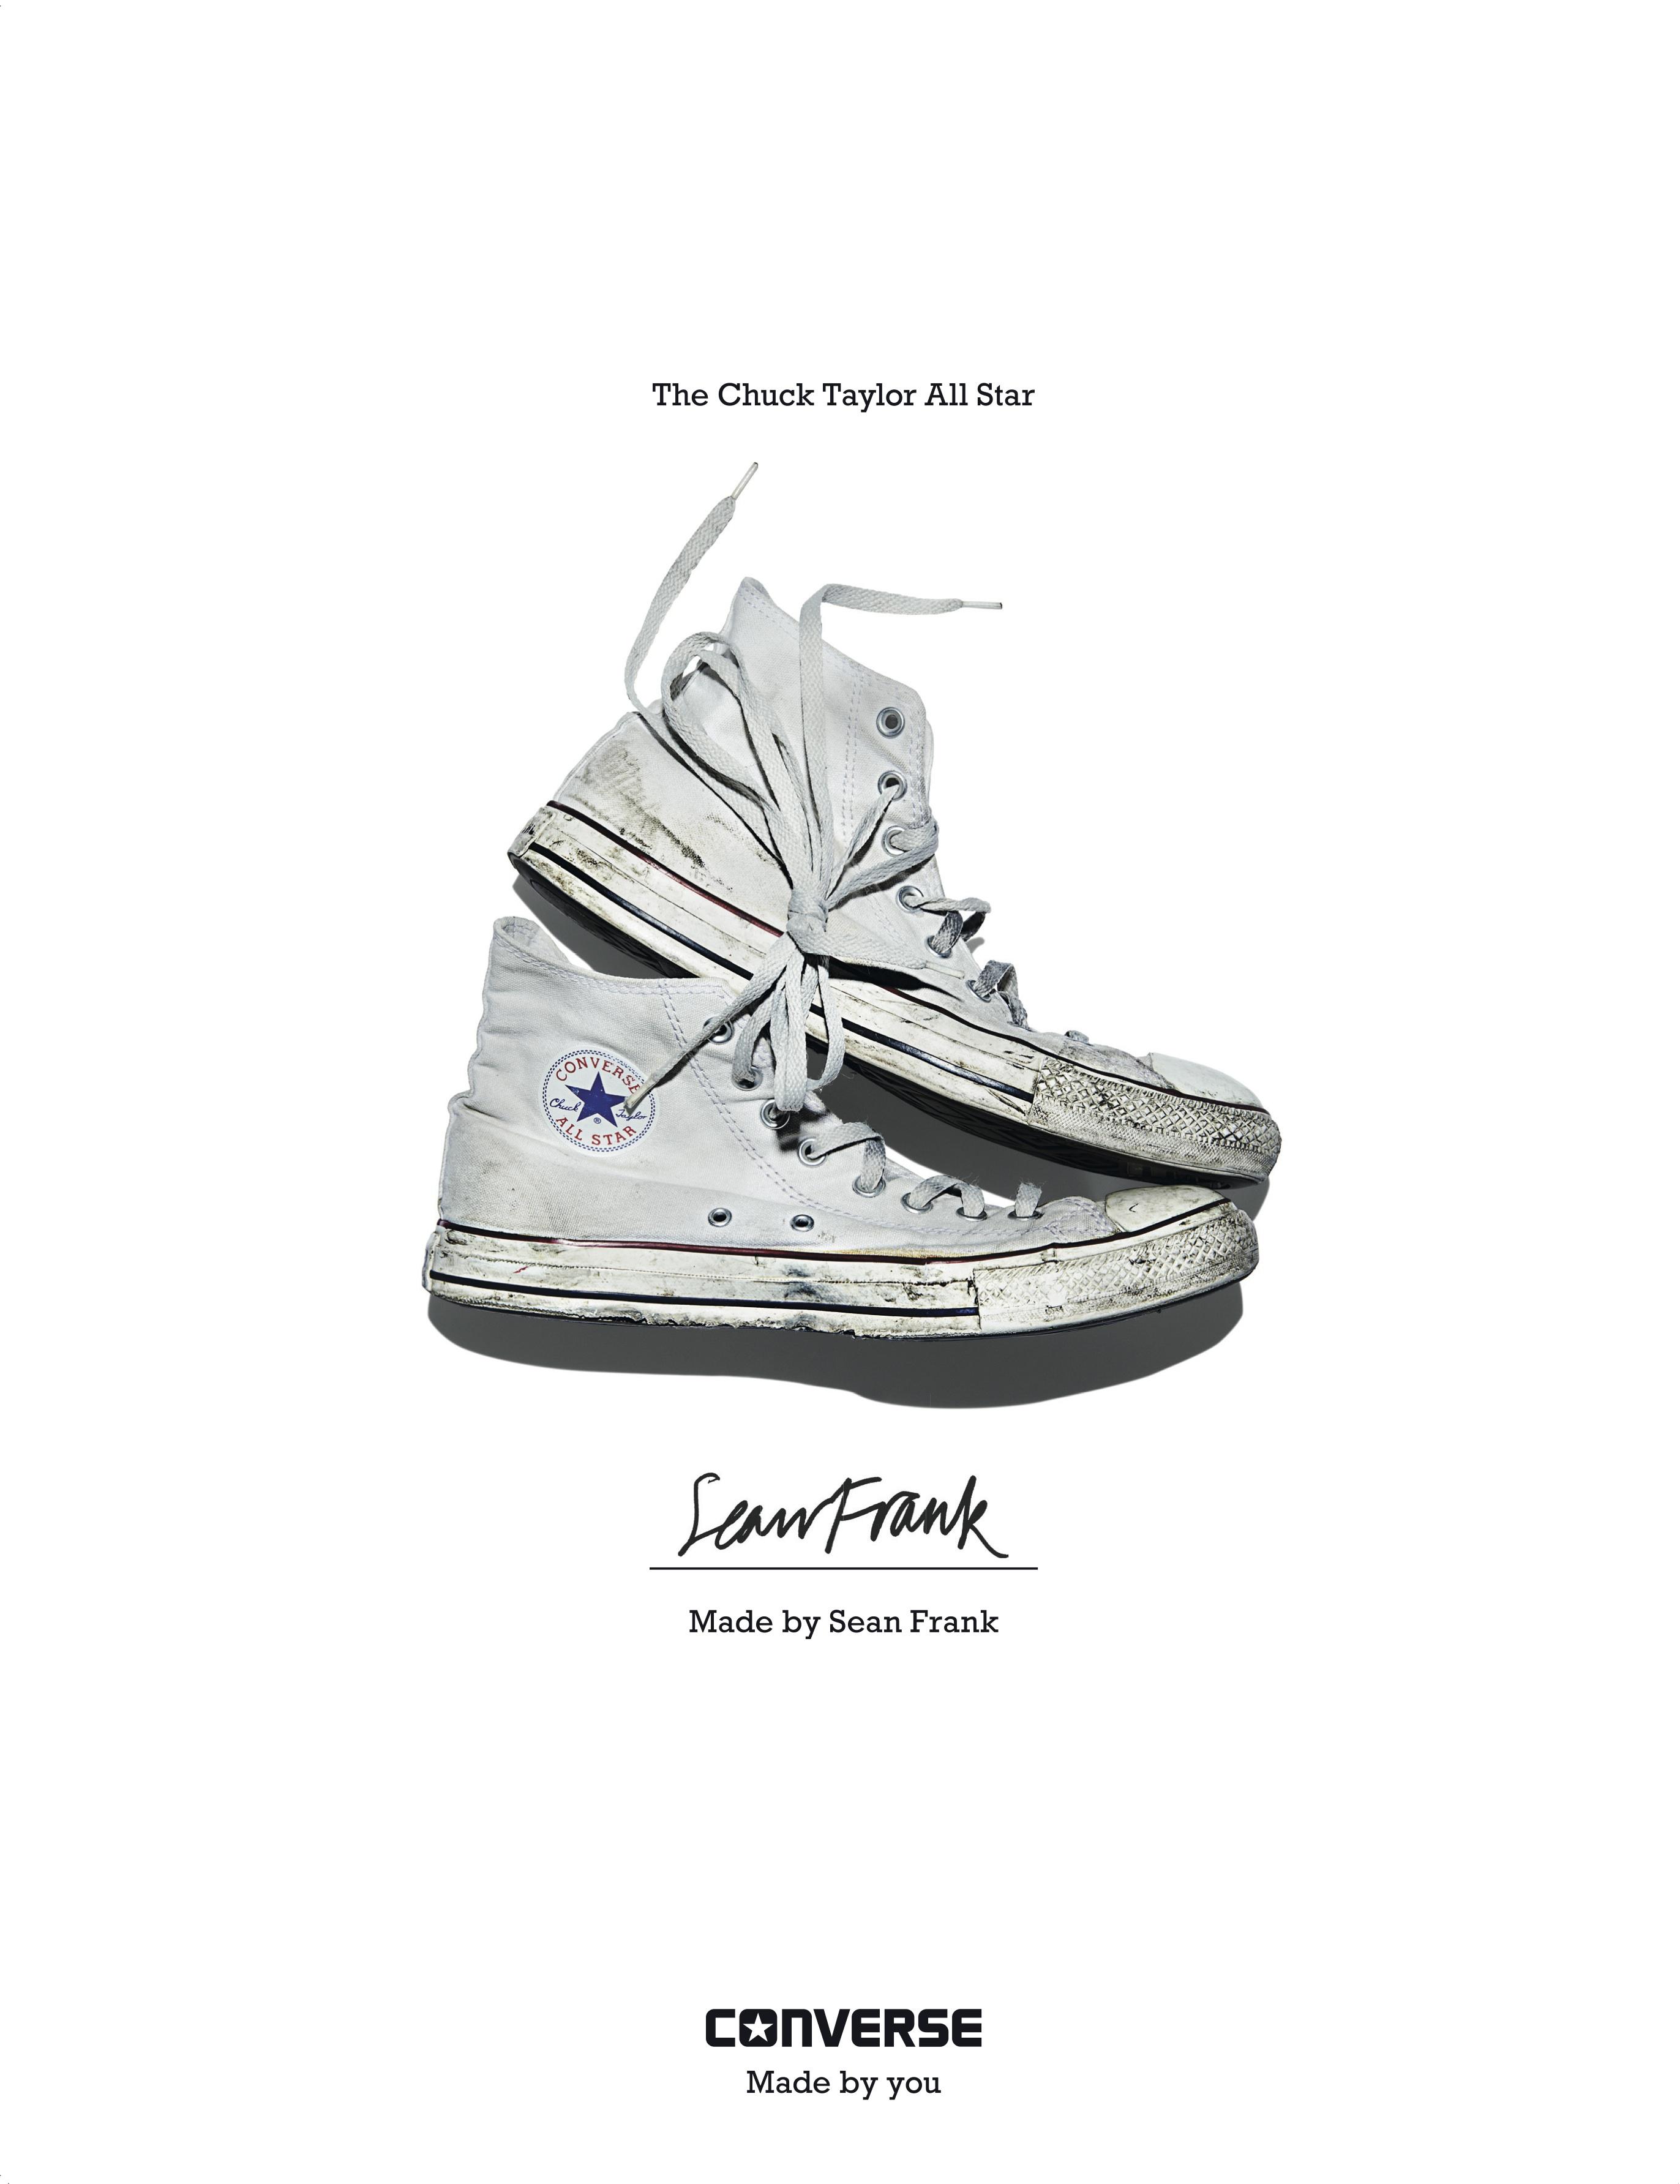 Sean Frank - Converse Sneaker Portrait